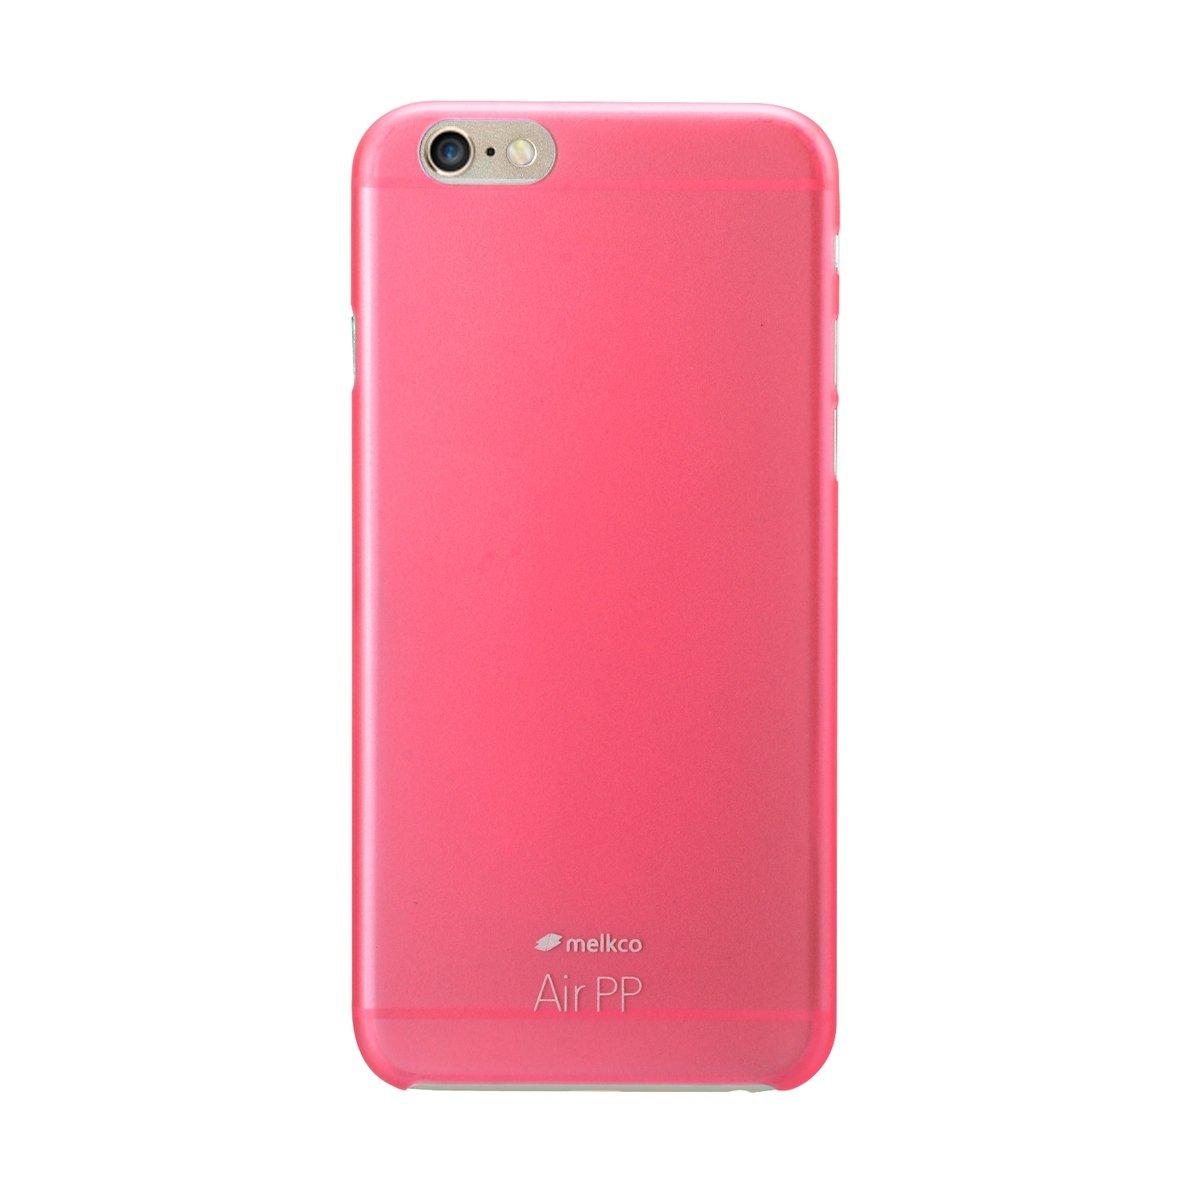 "iPhone 6 Plus/6S Plus (5.5"") Air PP 超薄防刮殼 - 紅色(附送屏幕保護貼)"